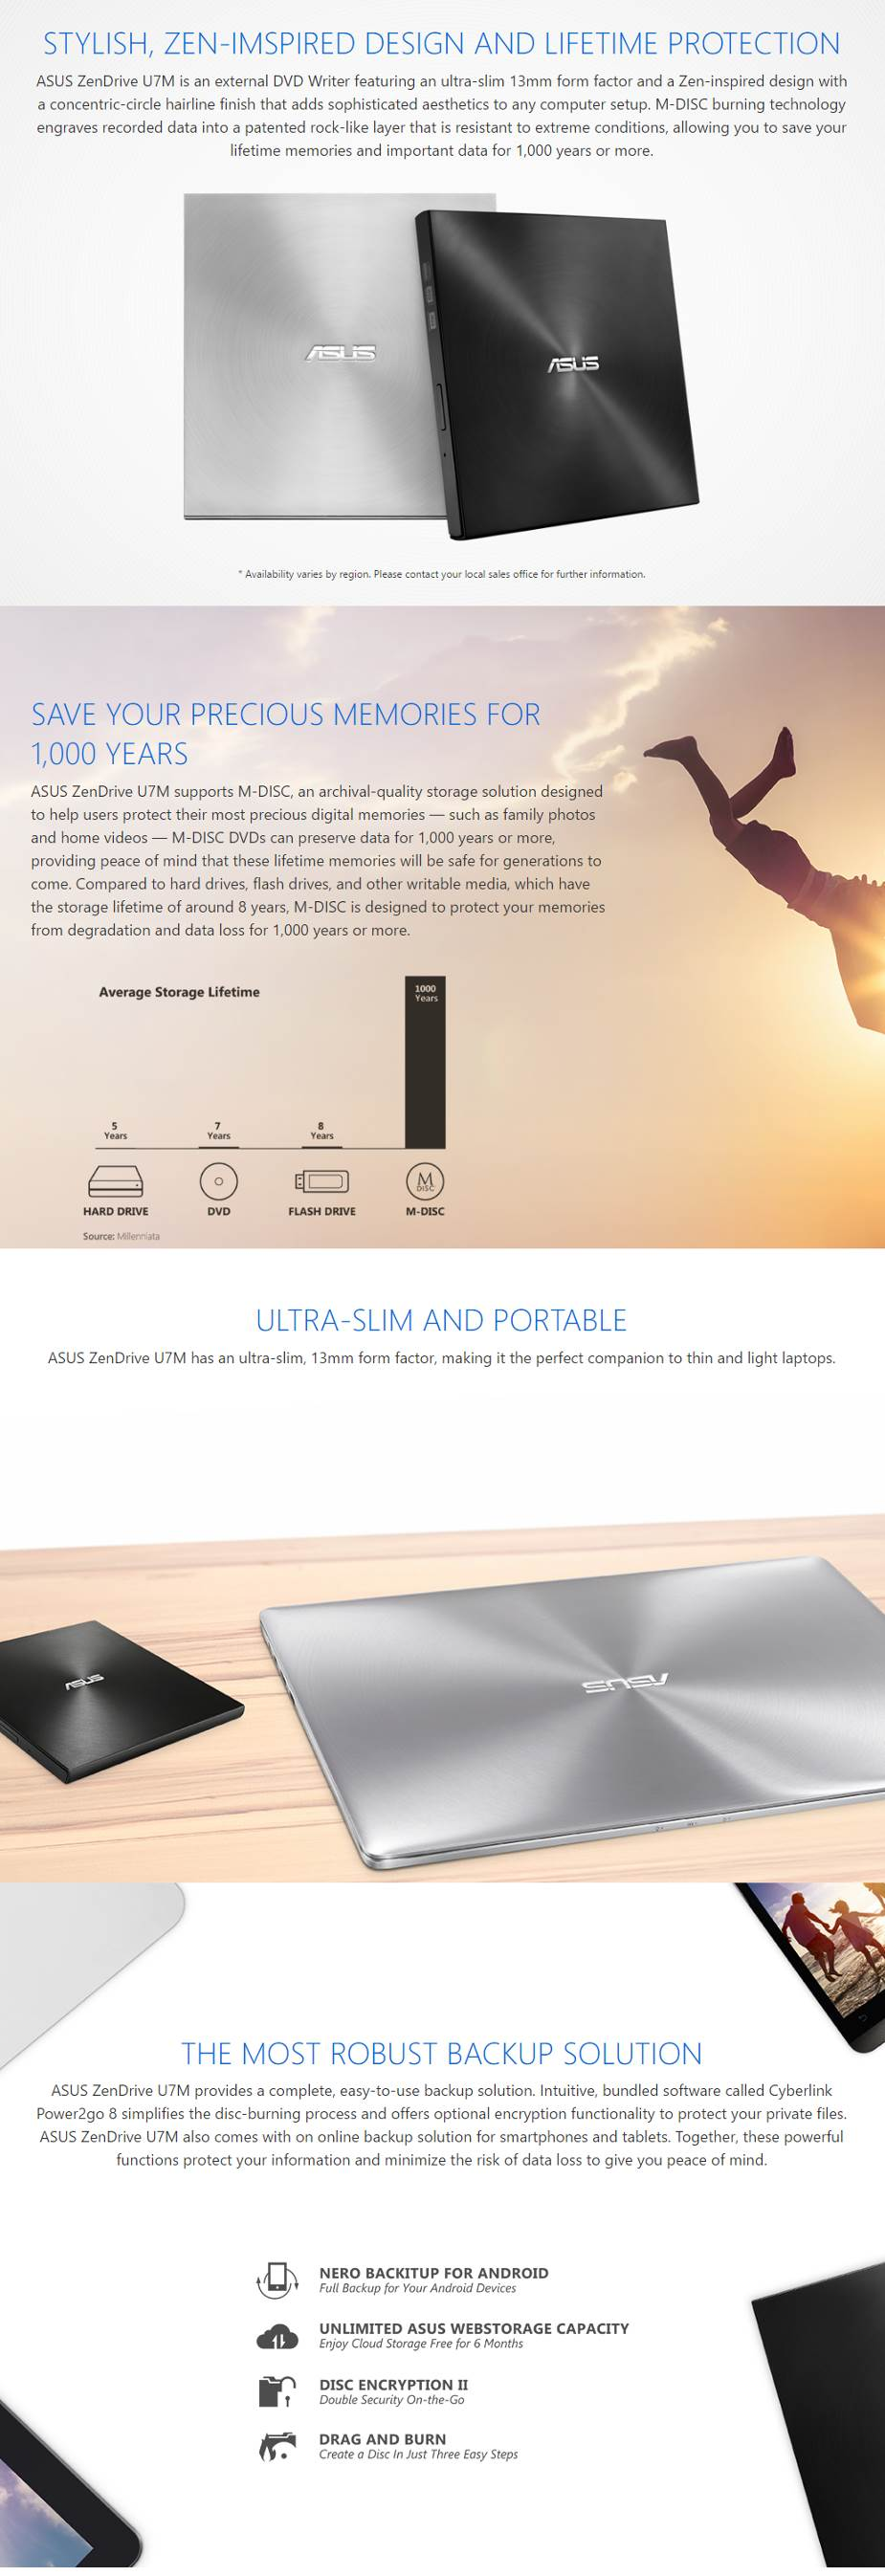 ASUS ZenDrive U7M External Ultra Slim DVD Writer